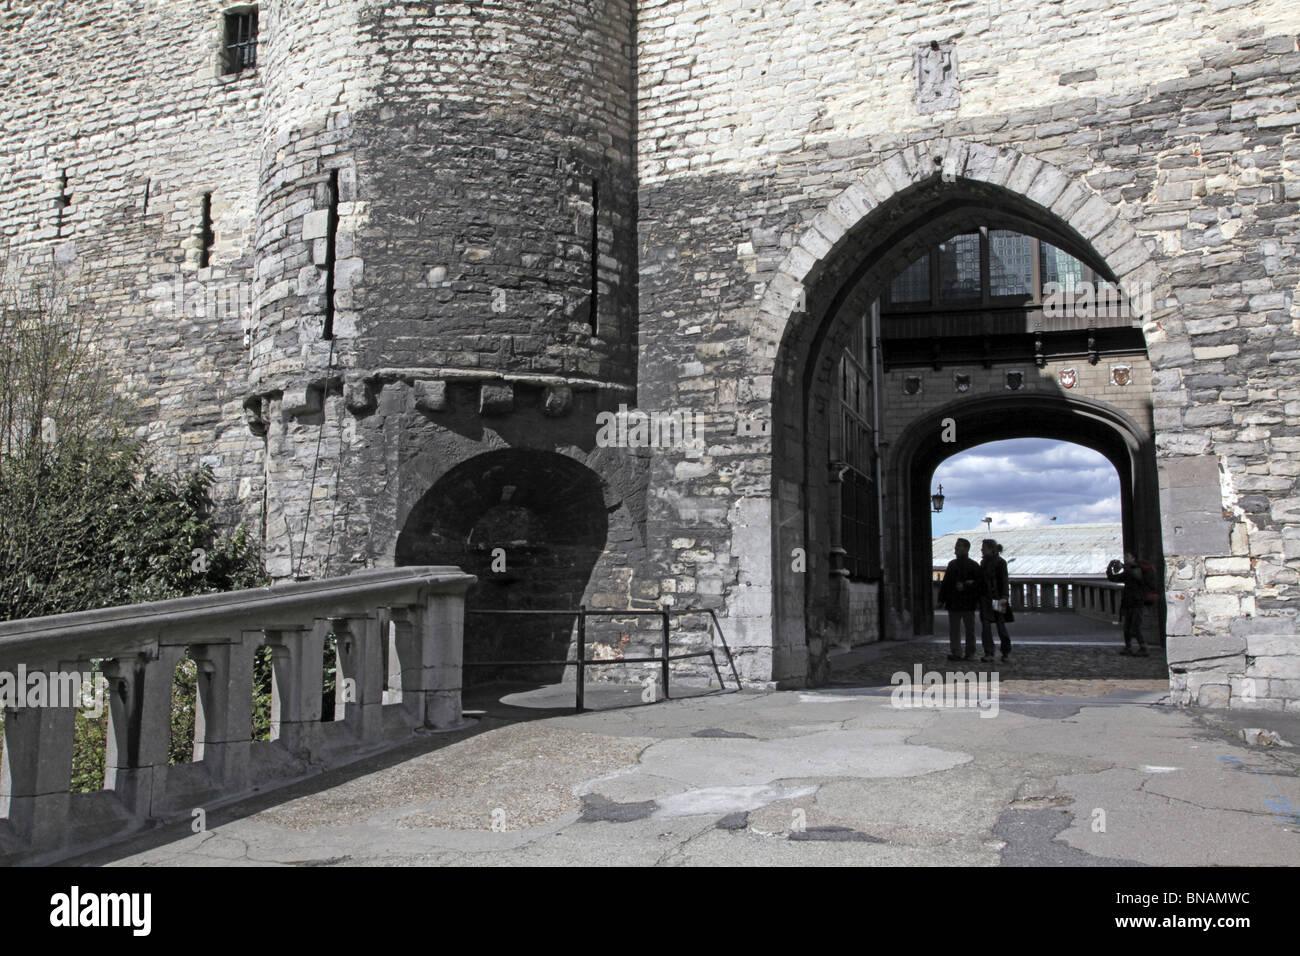 Het Steen, or stone fortification in the harbour of Antwerp - Stock Image